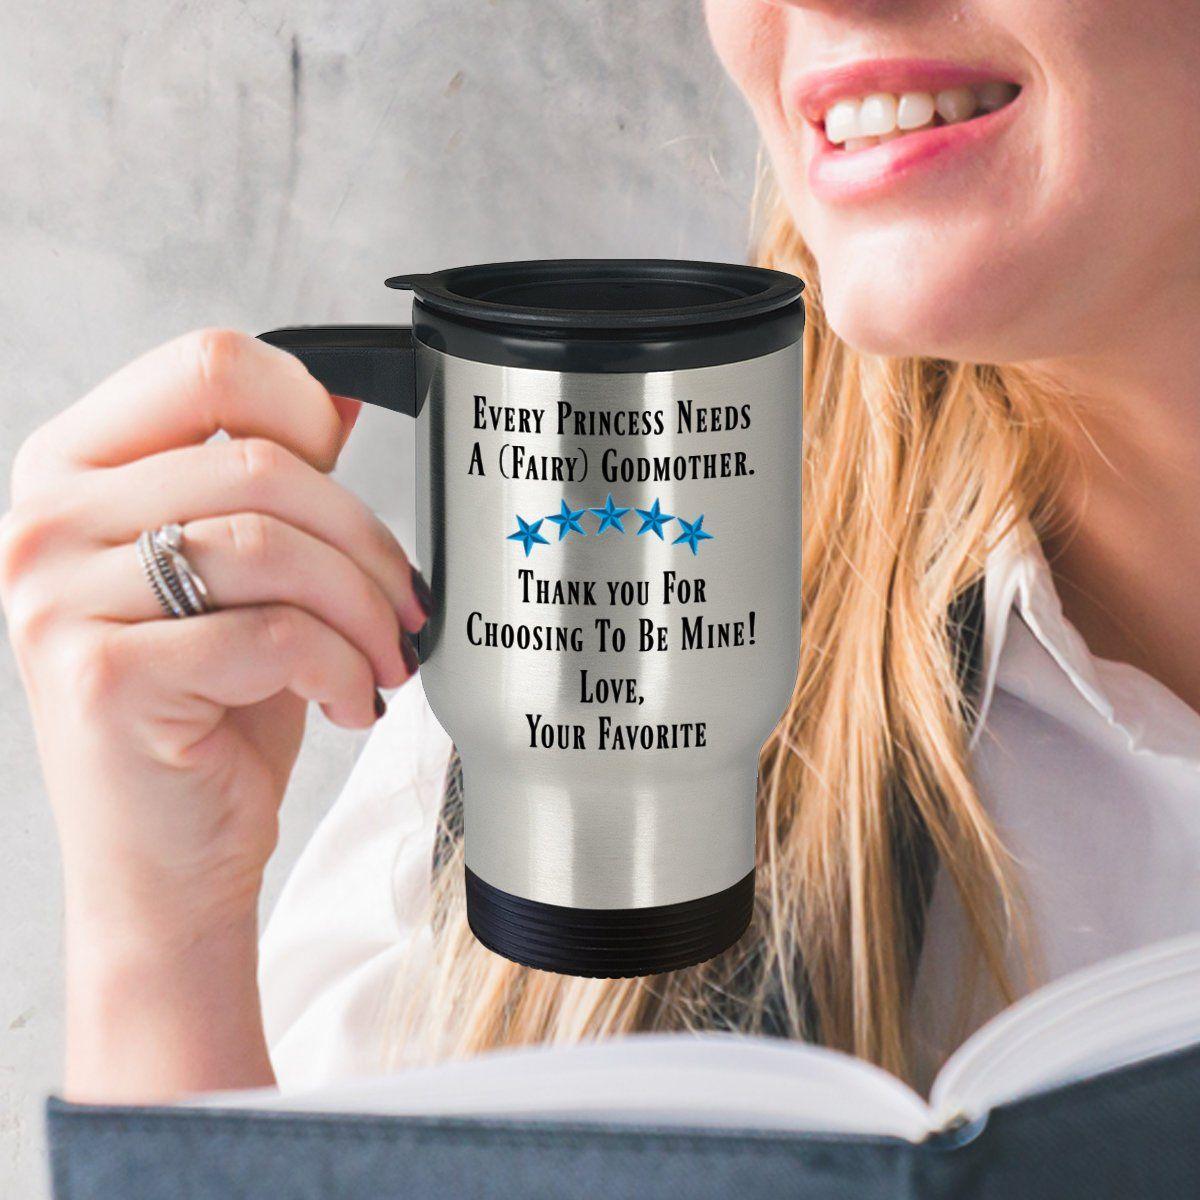 Fairy Godmother Travel Mug Godmother Presents Godmother Cup Thank